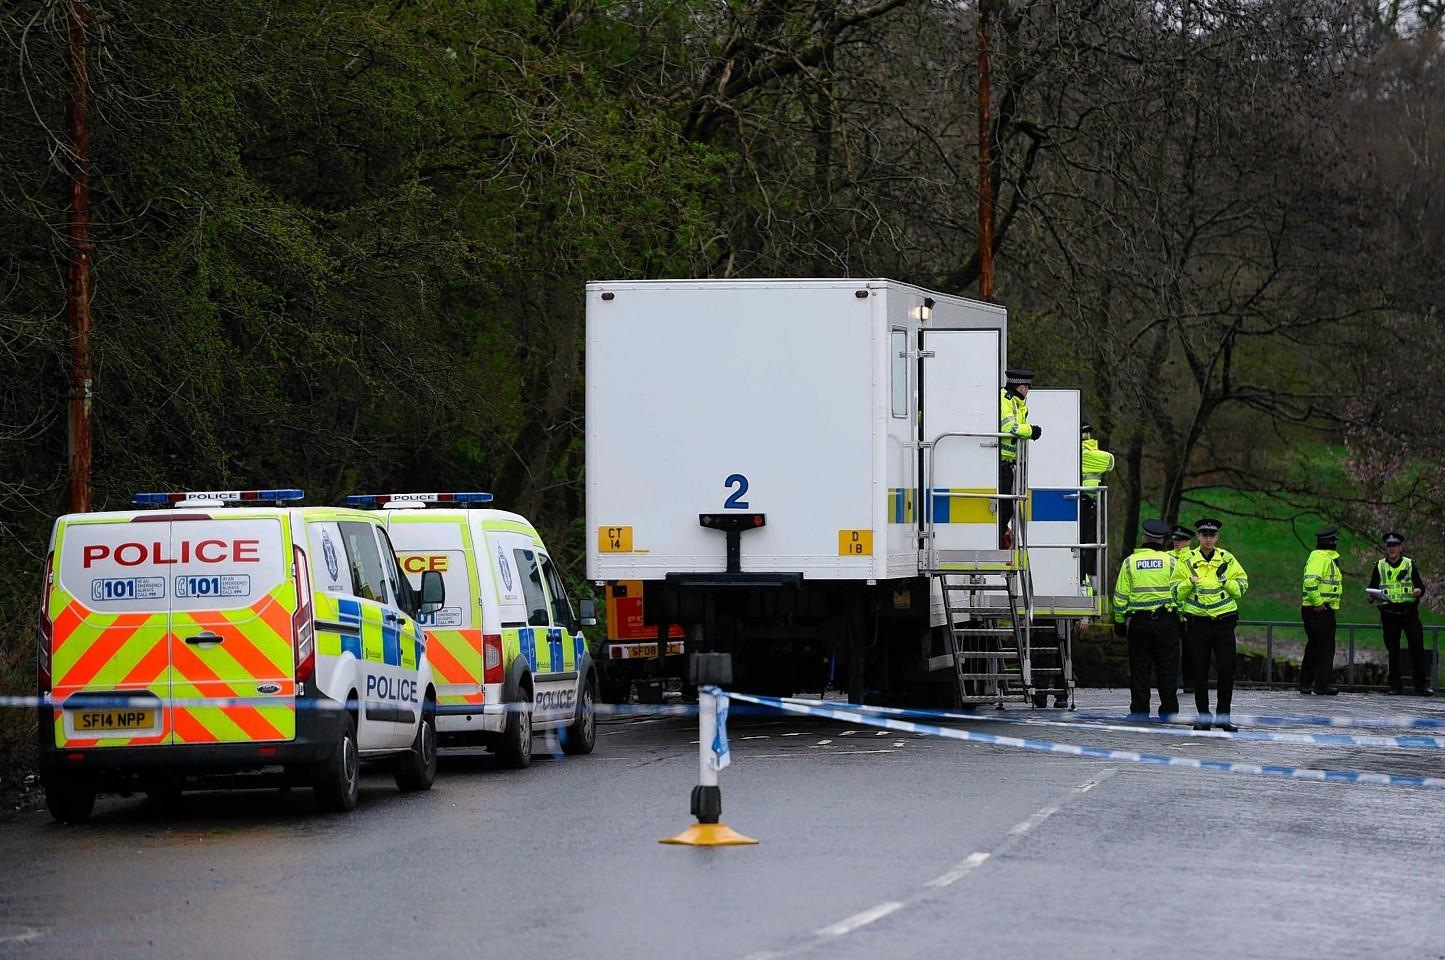 Police scene of crime teams scoured the park